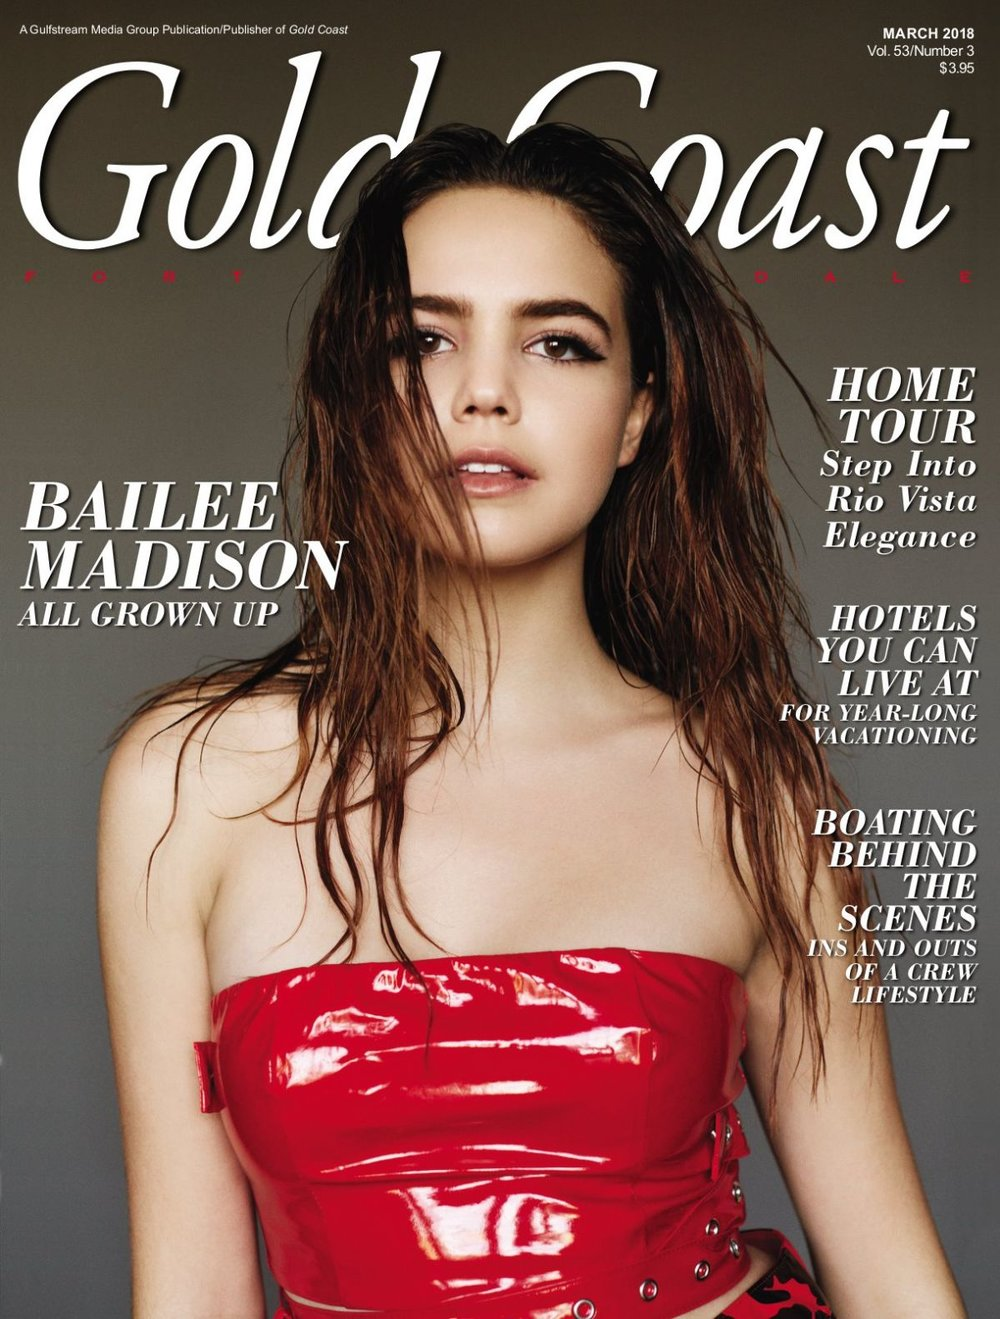 bailee-madison-in-gold-coast-magazine-march-2018-2.jpg